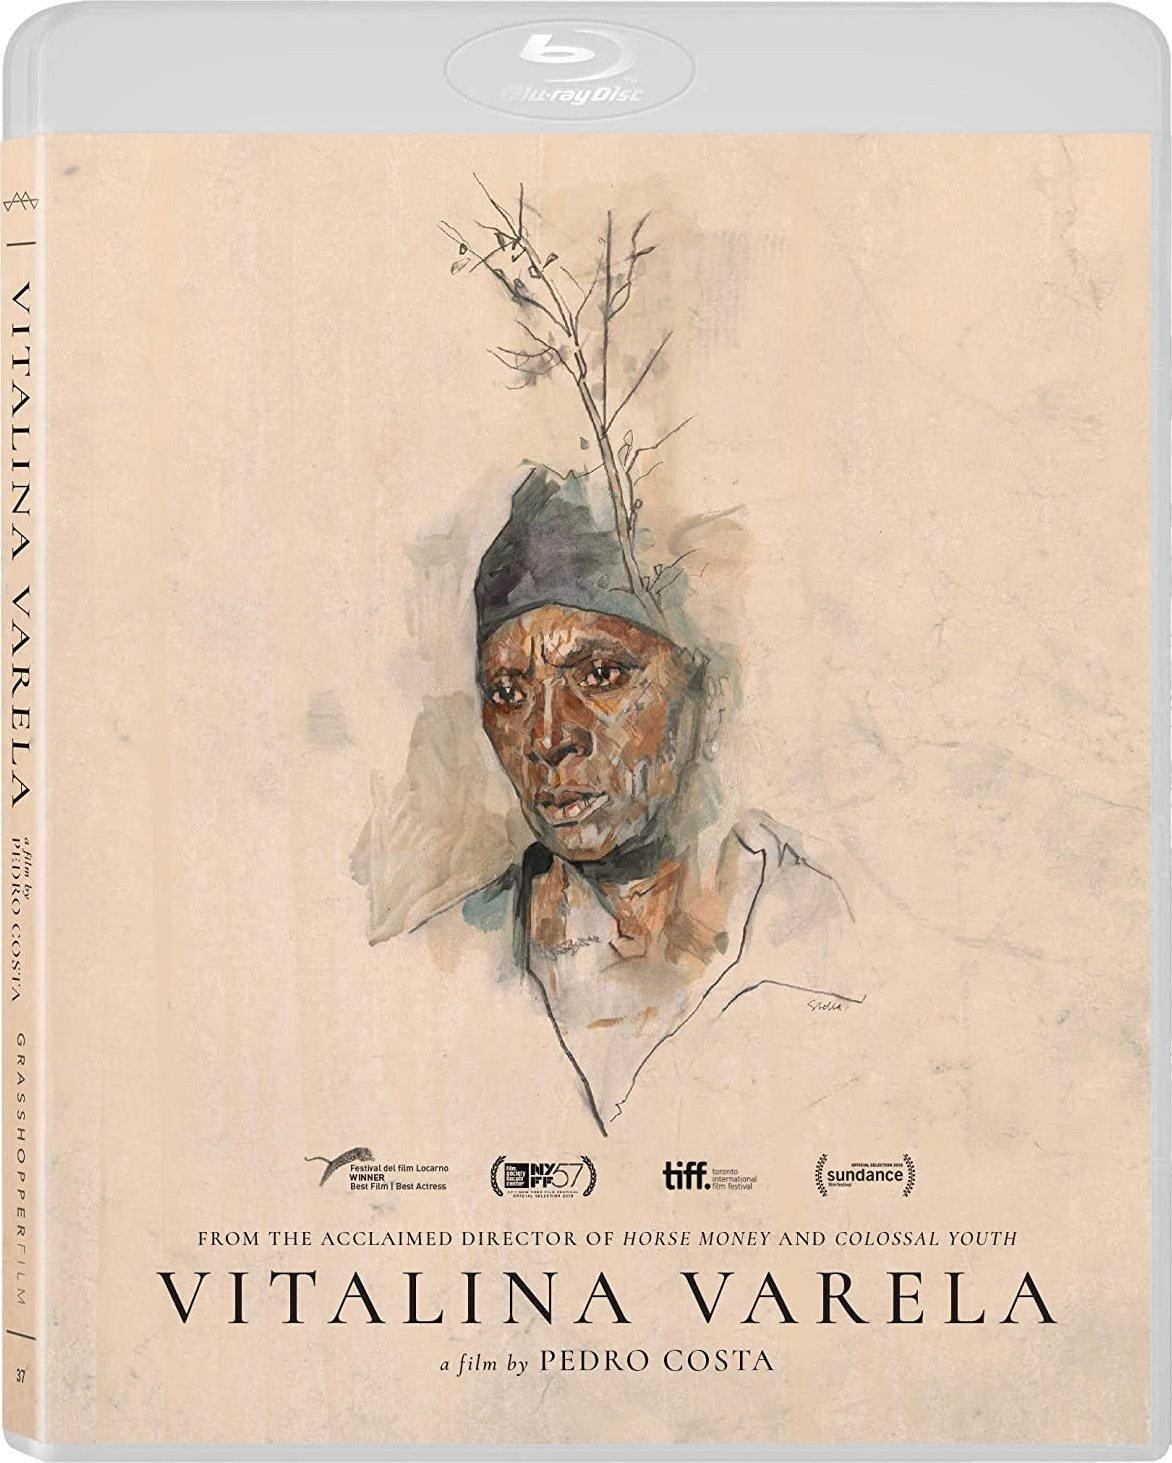 Vitalina Varela (2019) poster image